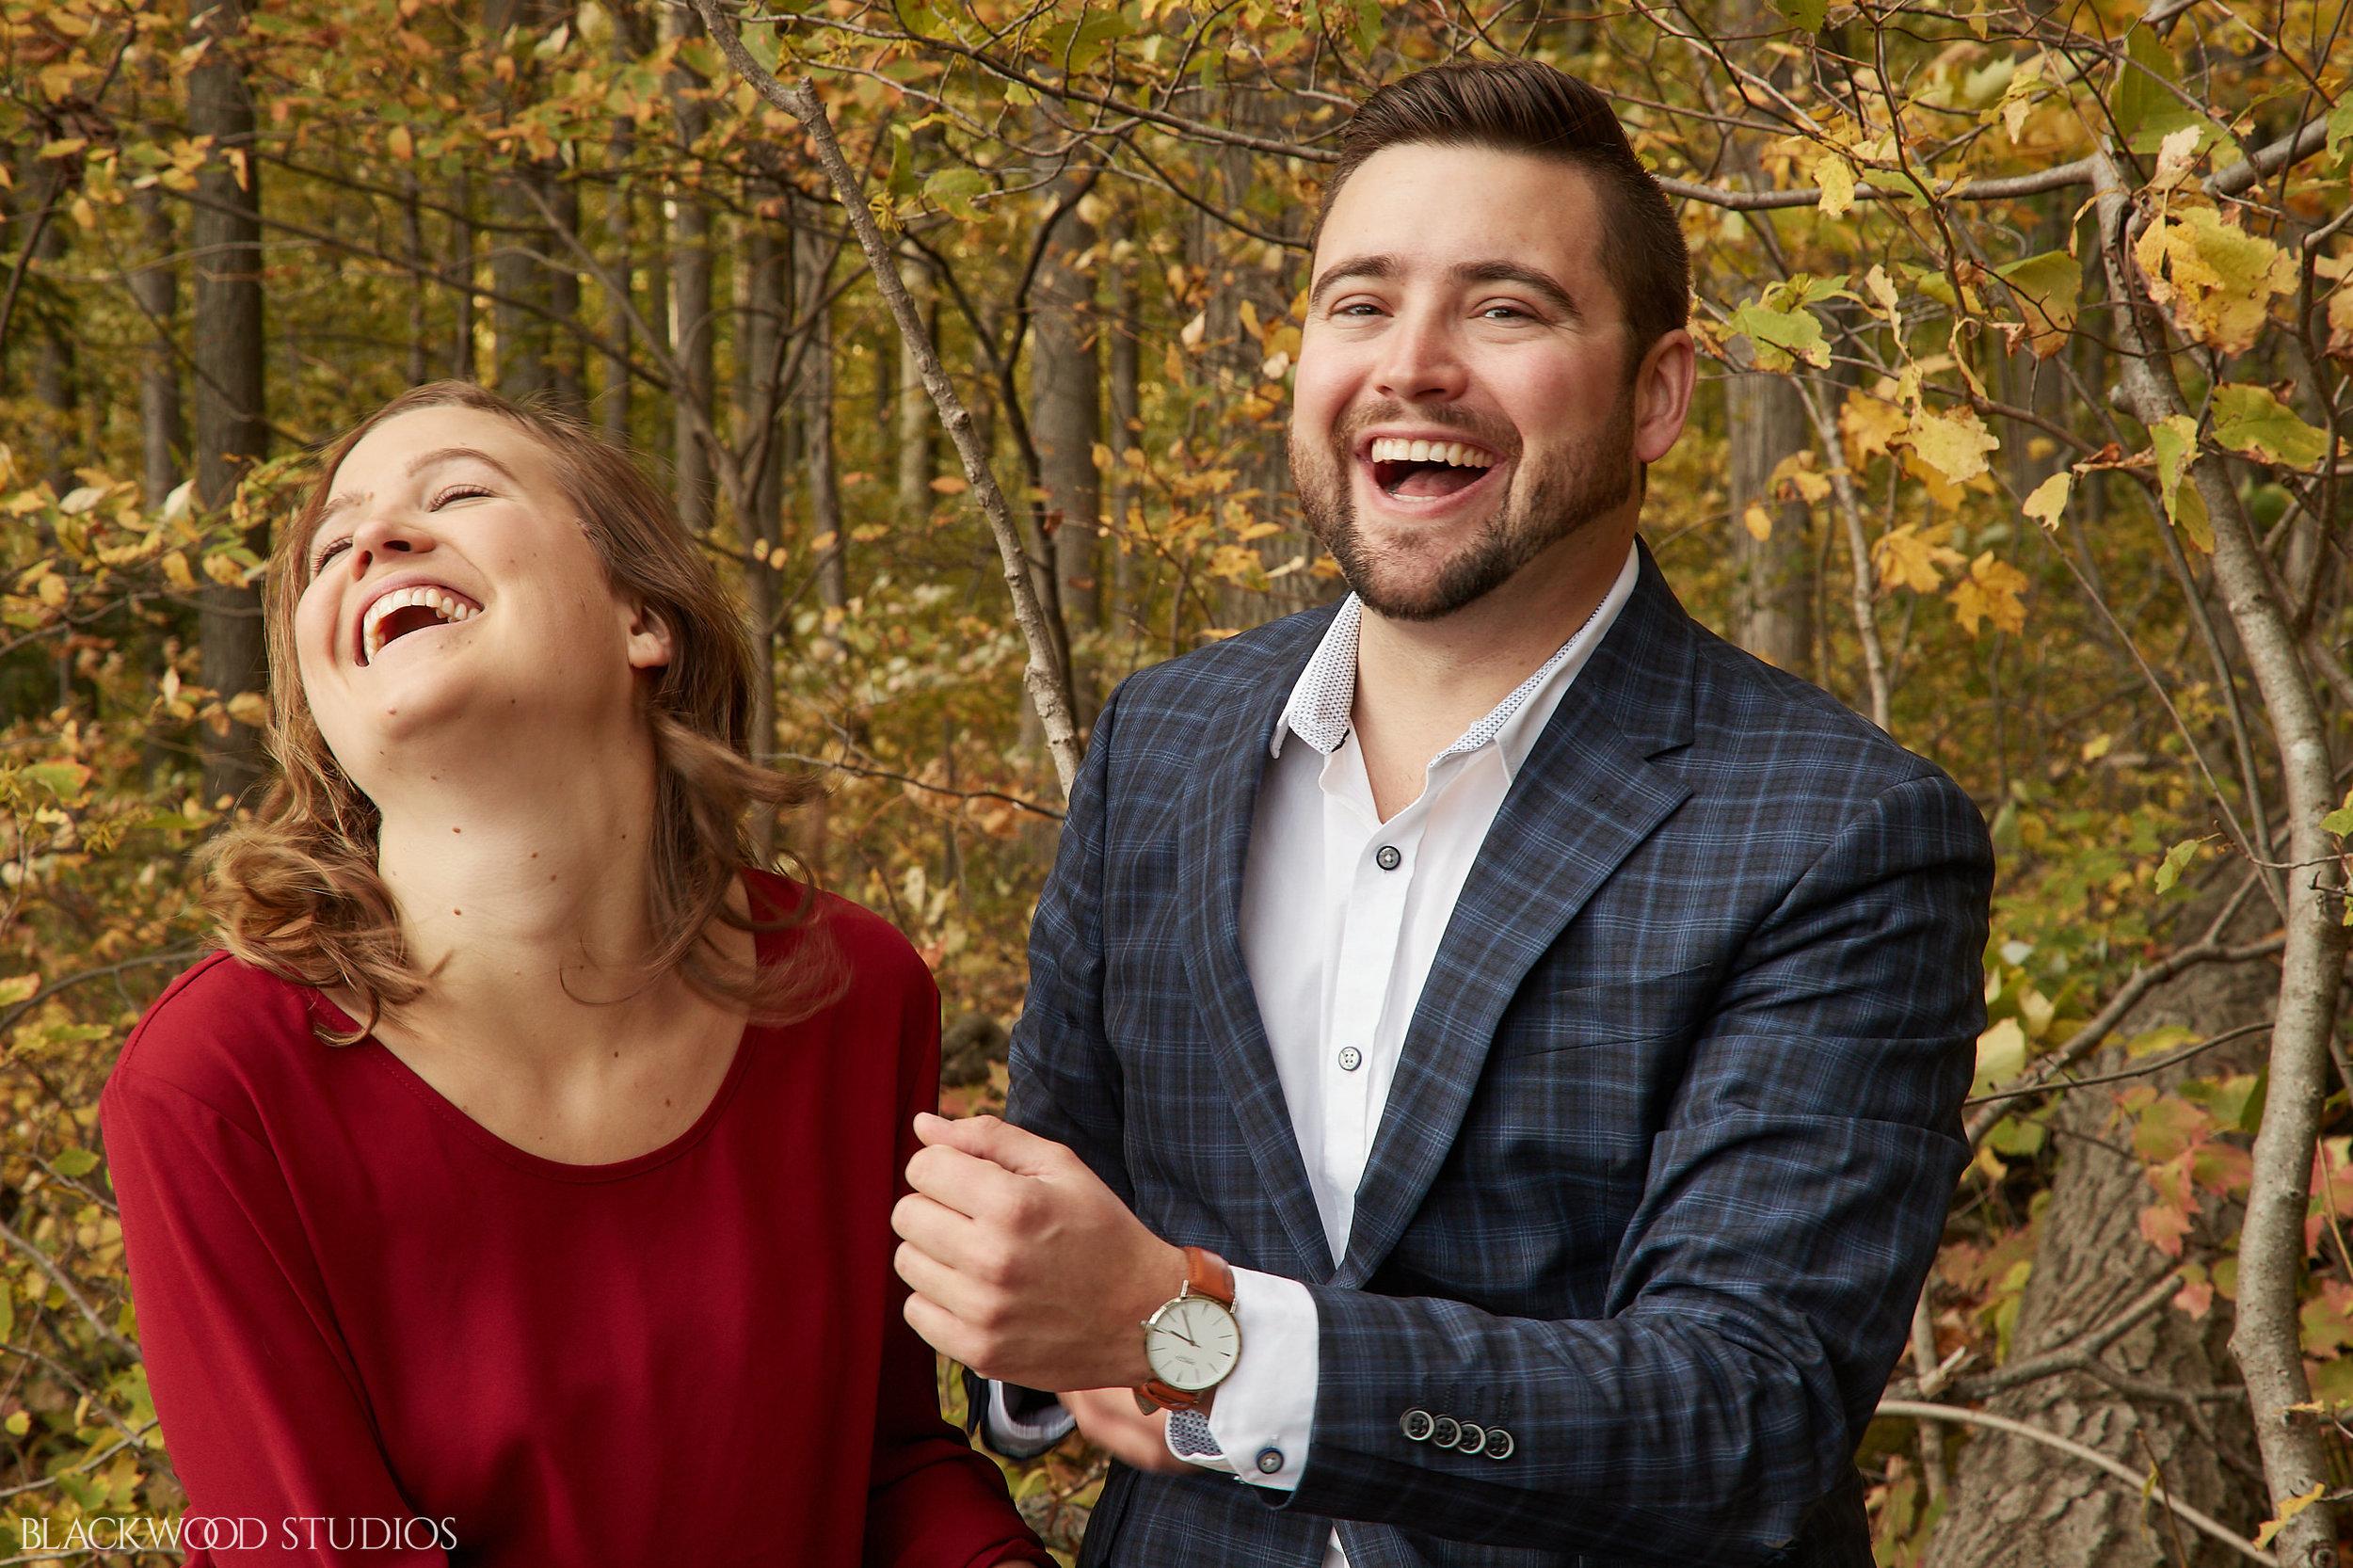 Blackwood-Studios-20181014-153450-Dave-and-Natalie-Engagement-0327-Rattlesnake-Point-Conservation-Area-Milton-Ontario.jpg